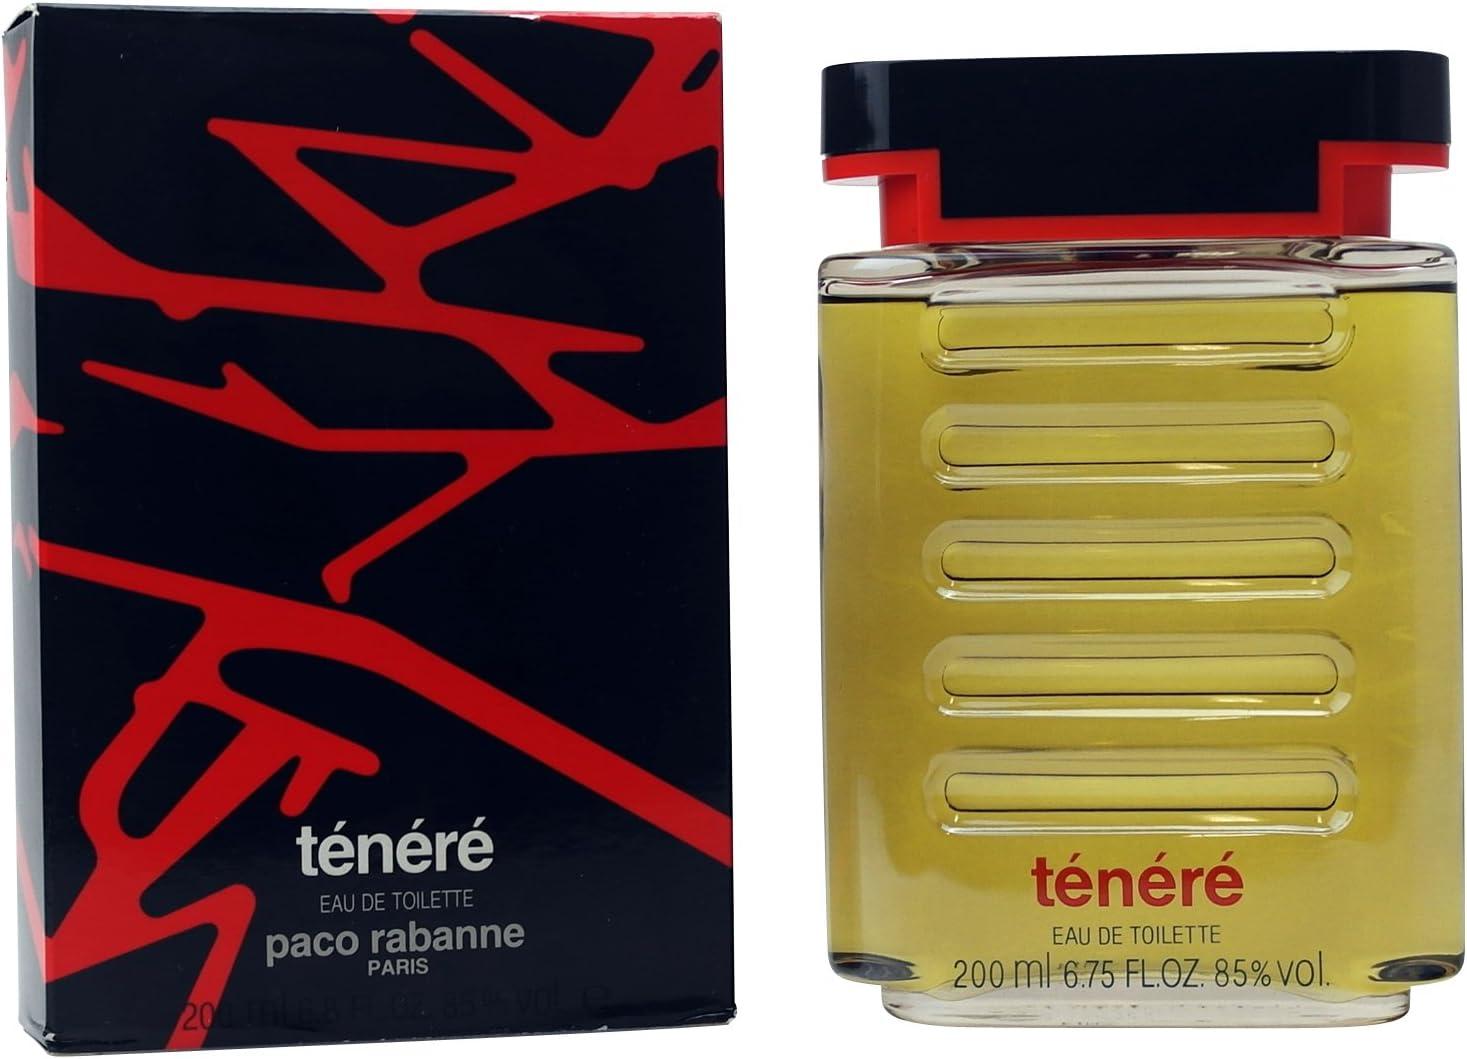 Paco Rabanne Tenere Eau de Toilette Splash 200 ml: Amazon.es: Belleza